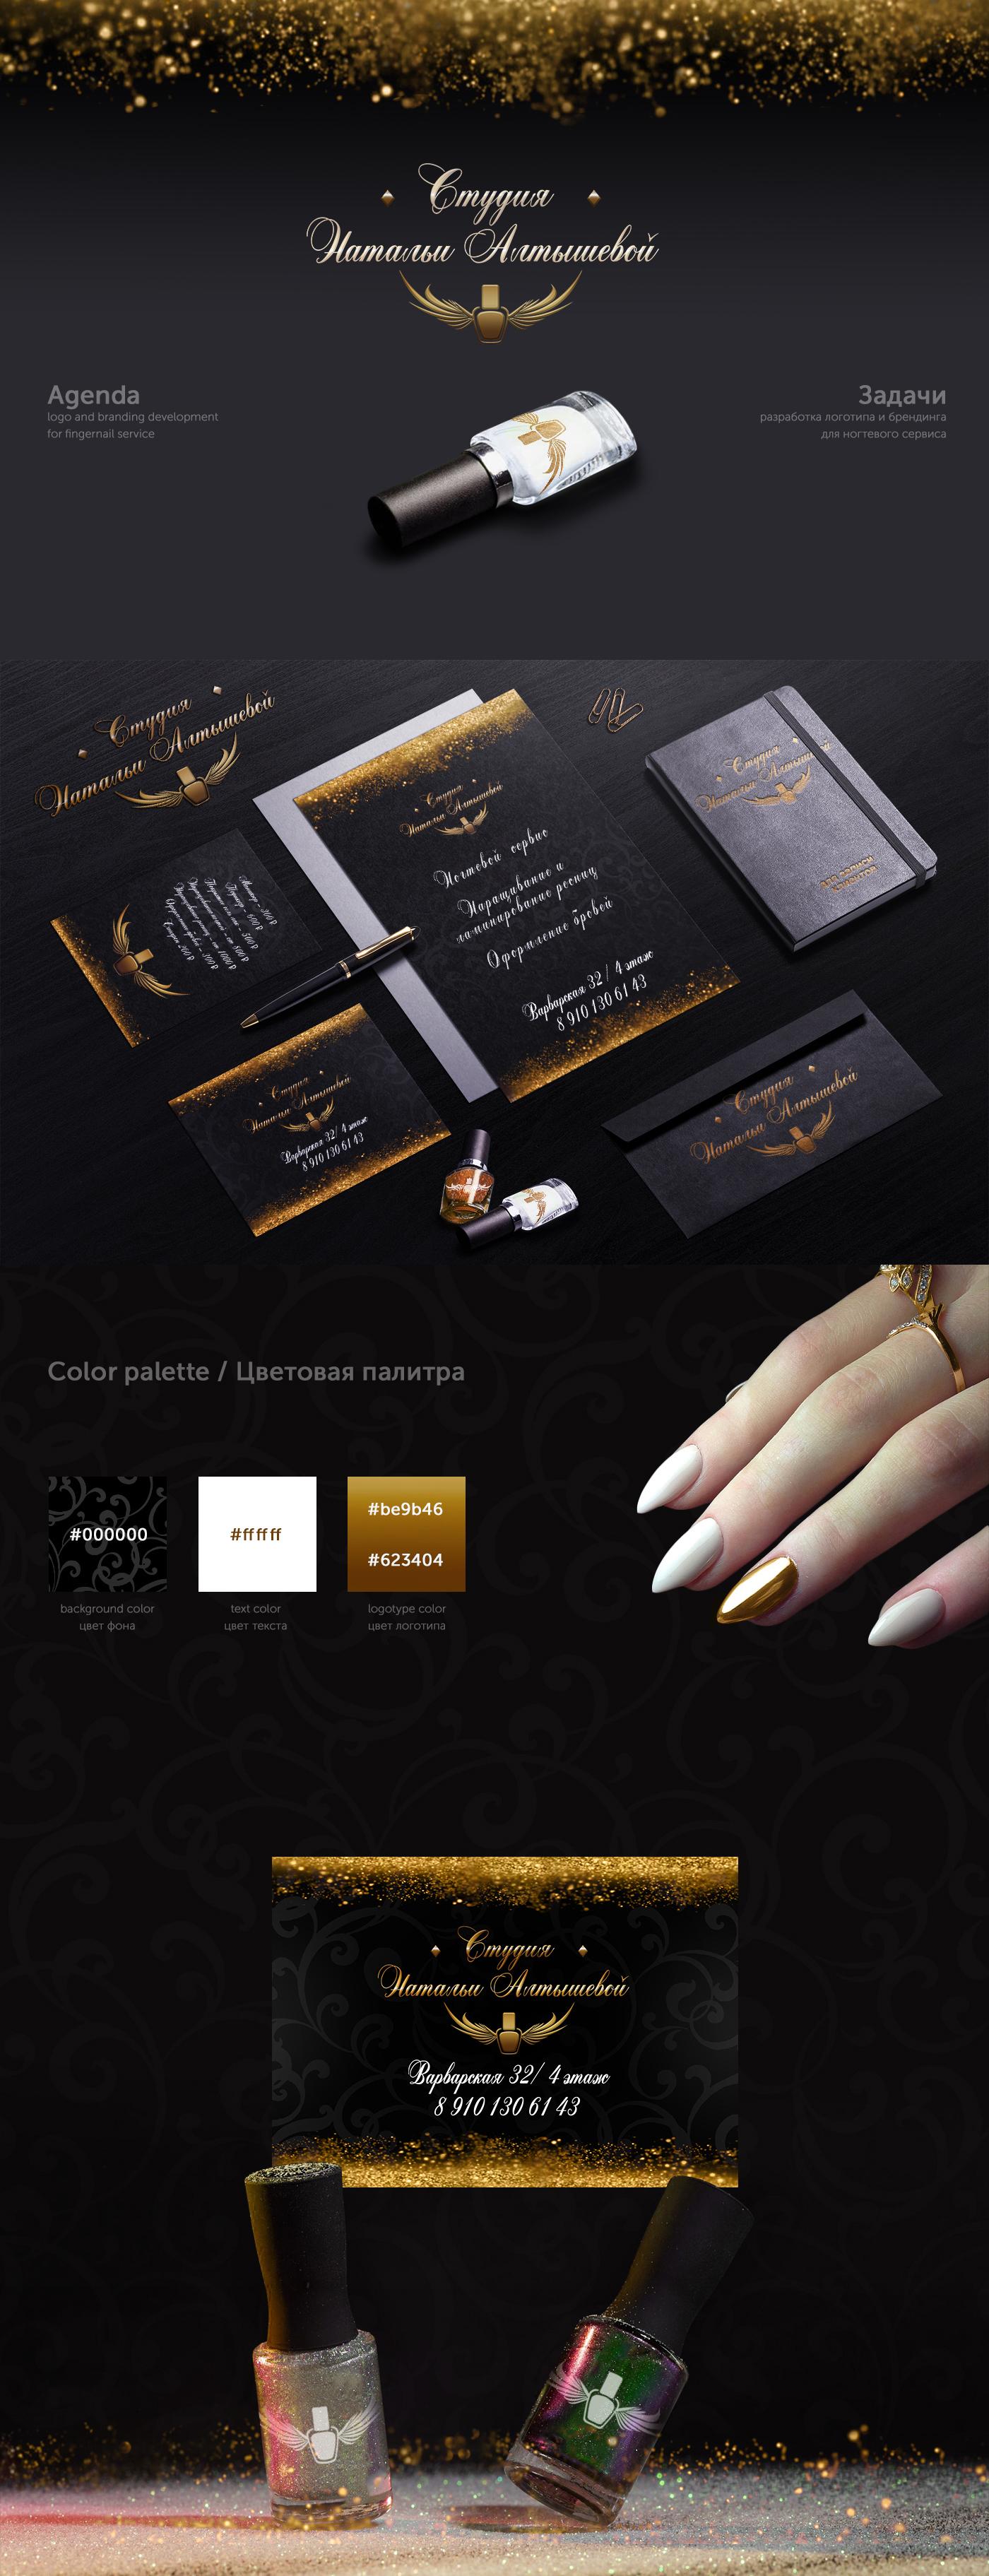 «Студия ногтевого сервиса» – логотип и айдентика